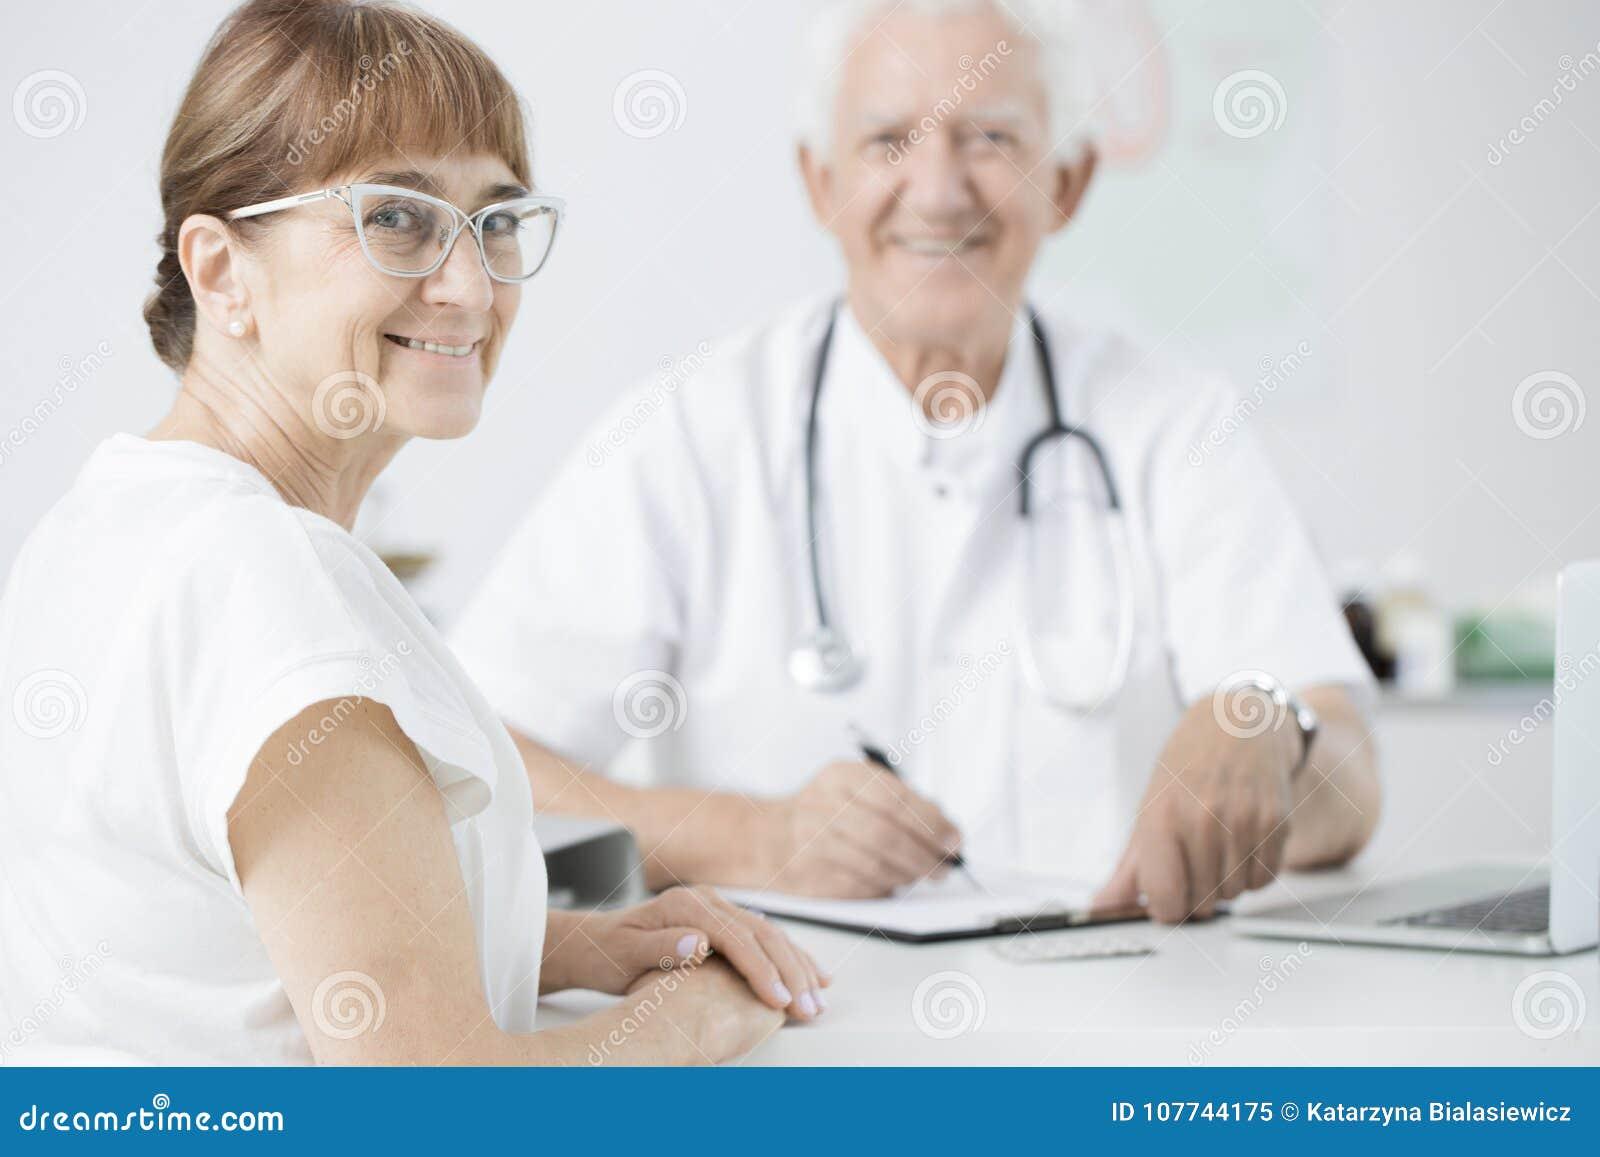 Paciente durante o exame médico periódico